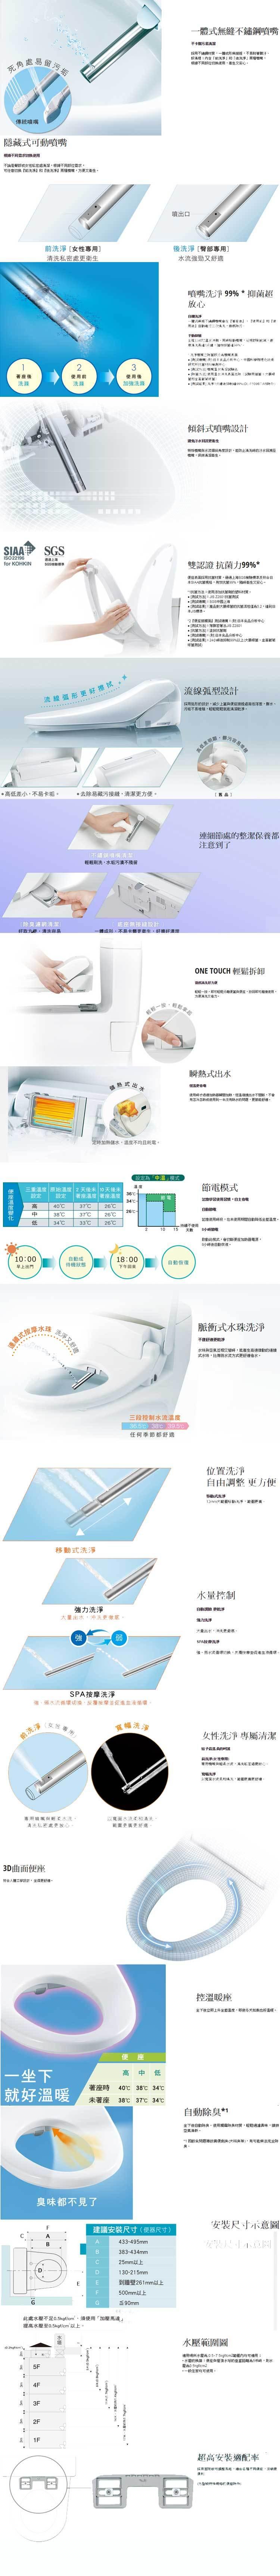 Panasonic 國際 DL-PH20TWS  溫水洗淨便座 完售